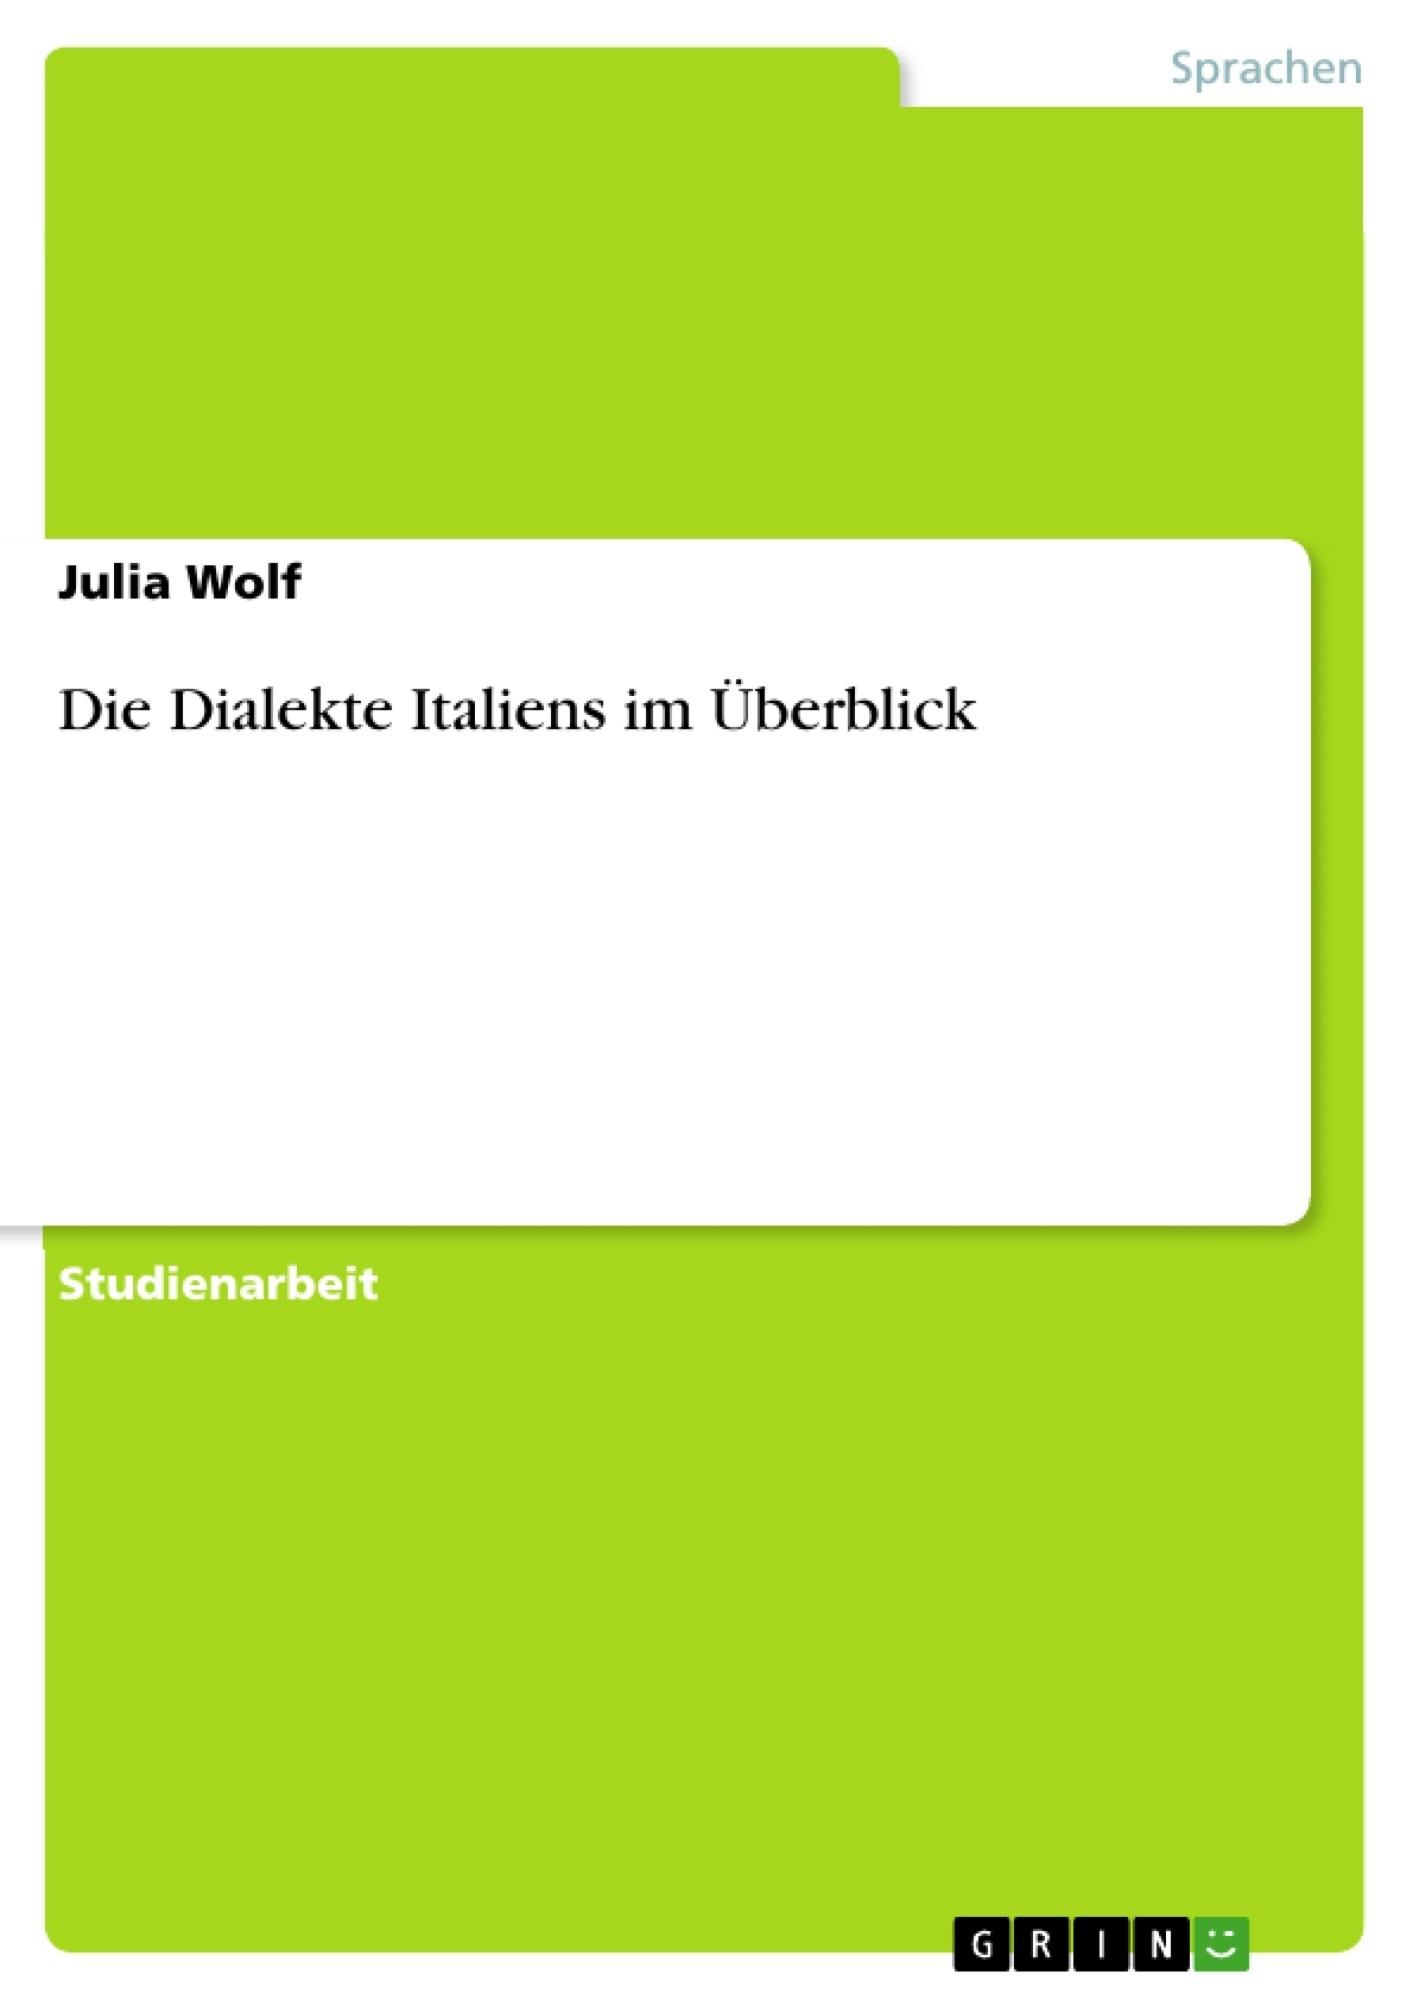 Titel: Die Dialekte Italiens im Überblick